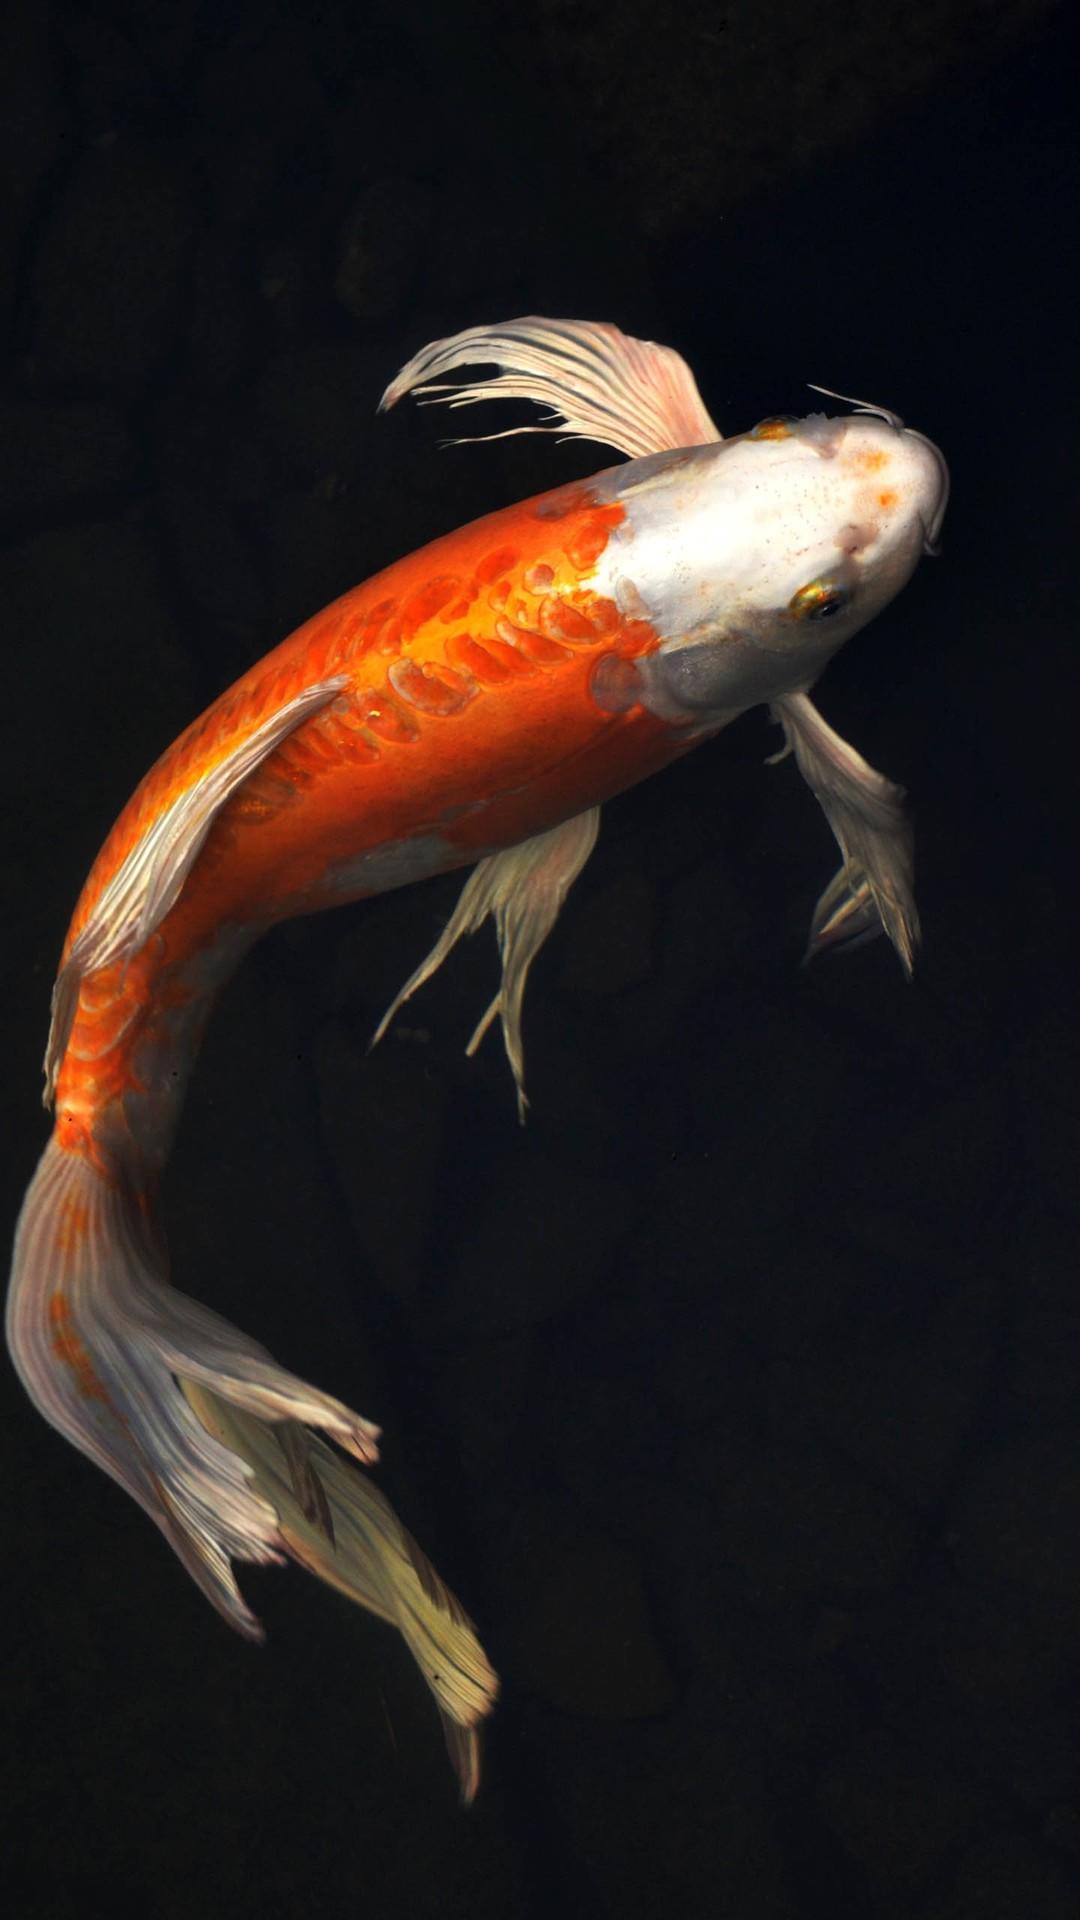 Fish Wallpaper Fish iPhone 7 wallpaper 1080x1920 ...